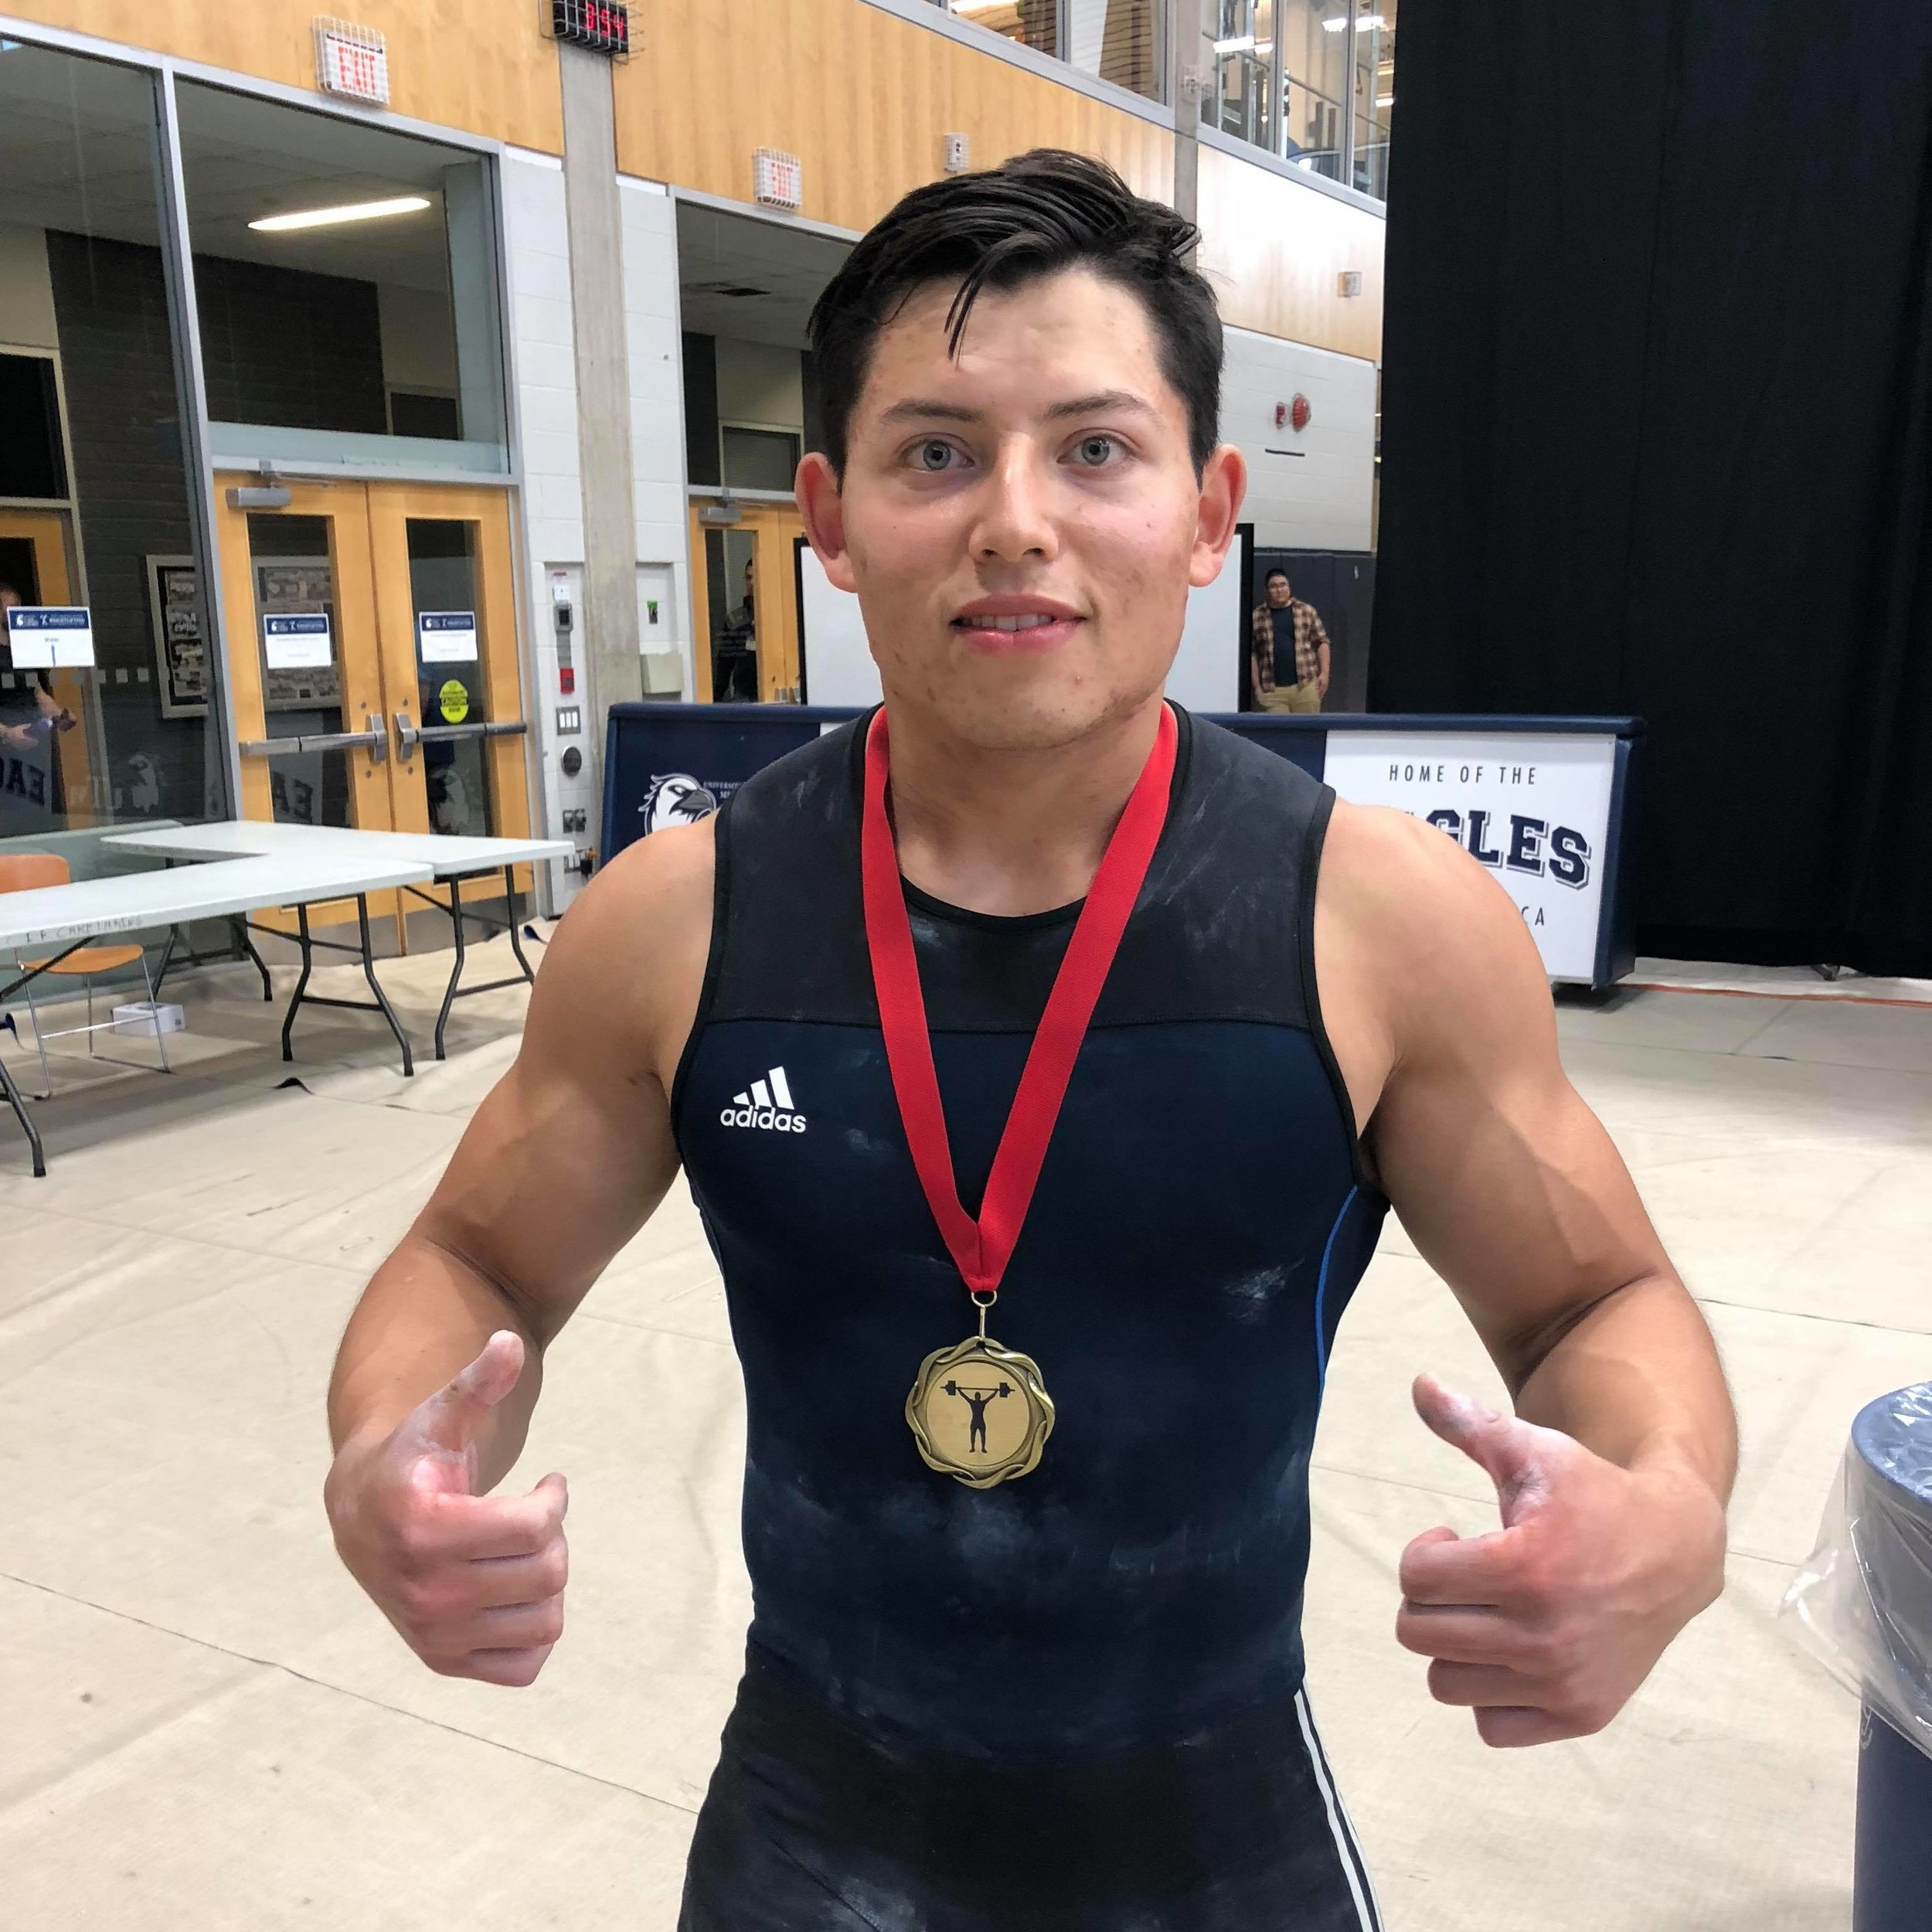 David Samayoa - Gold medal in 85kg class